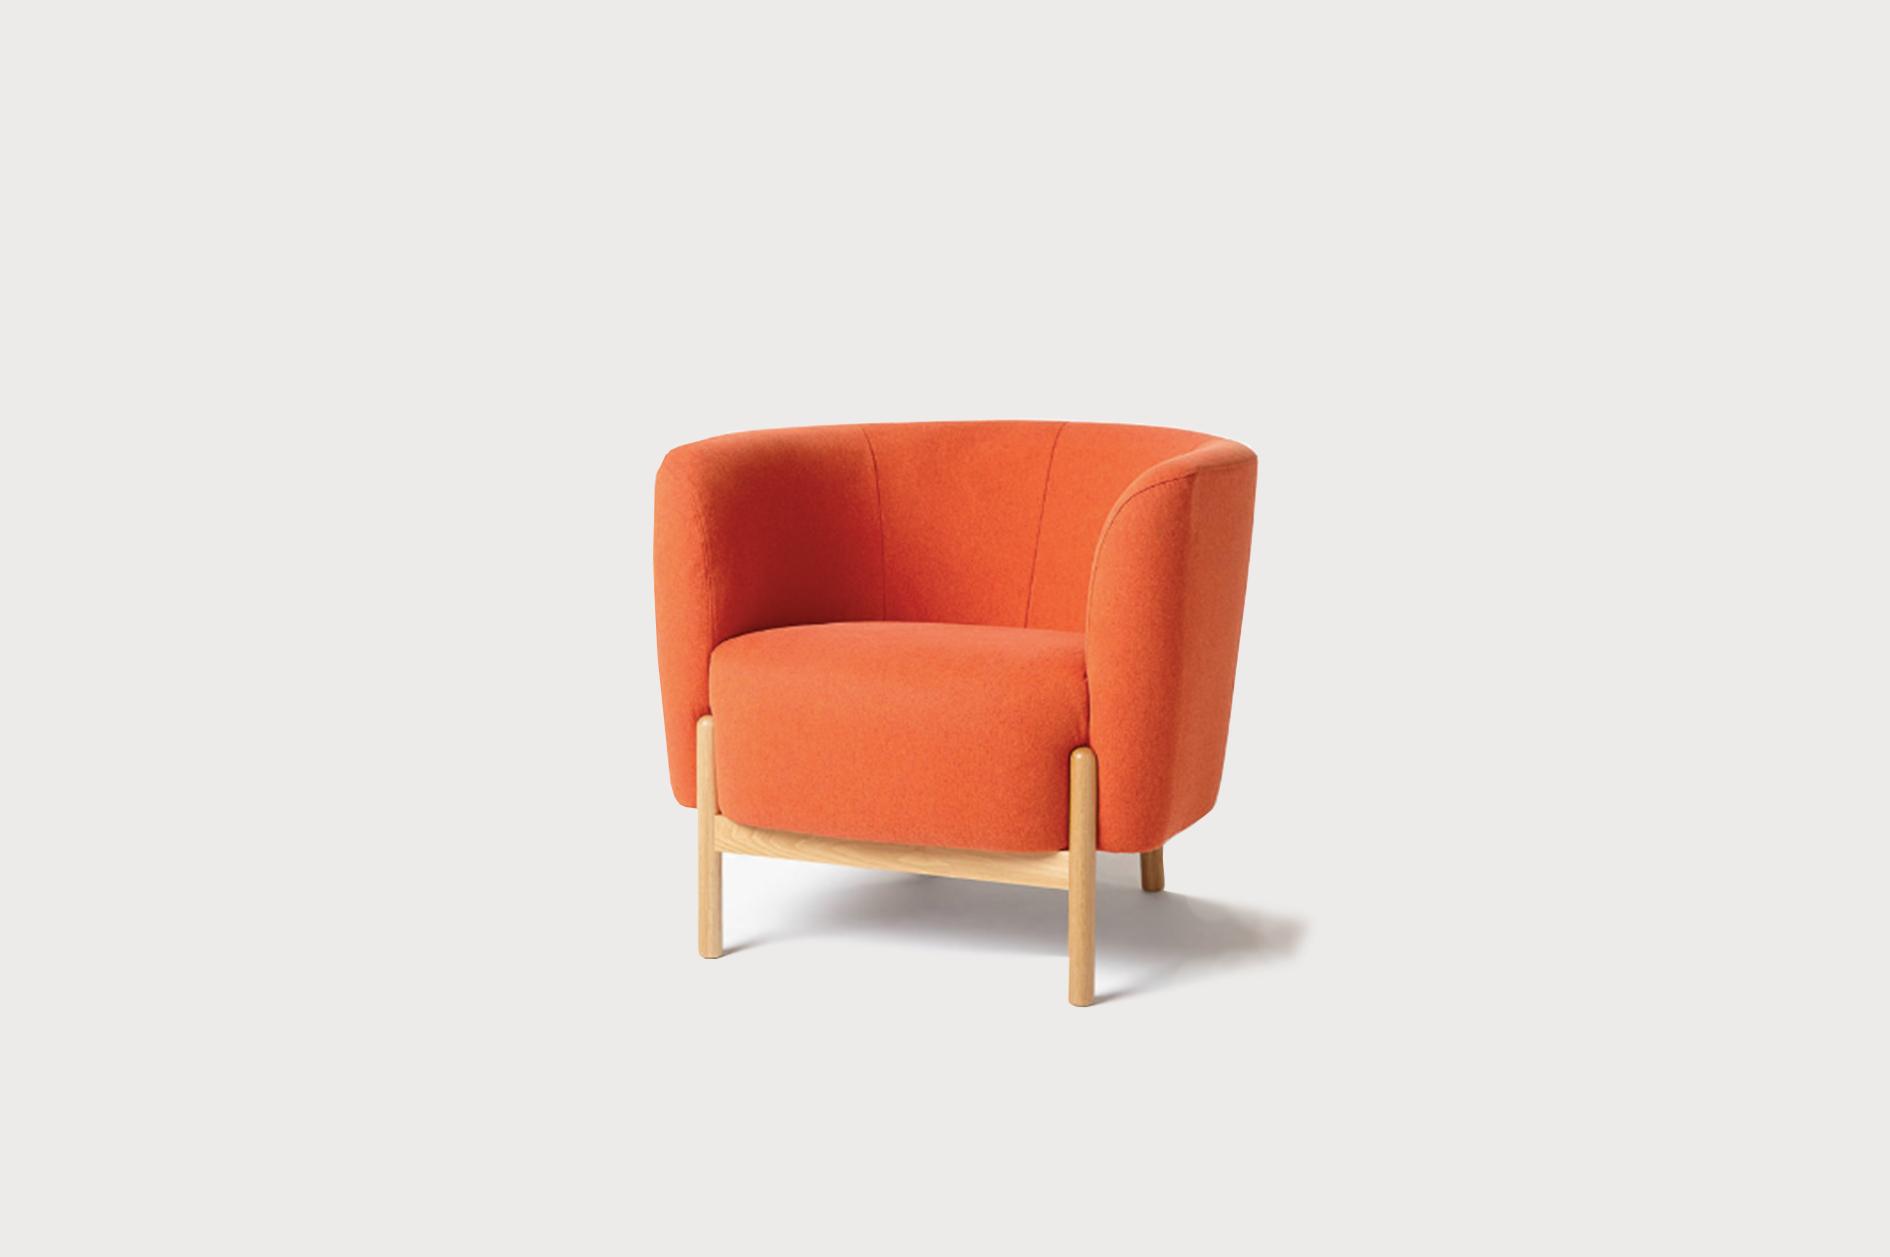 chub chair orange